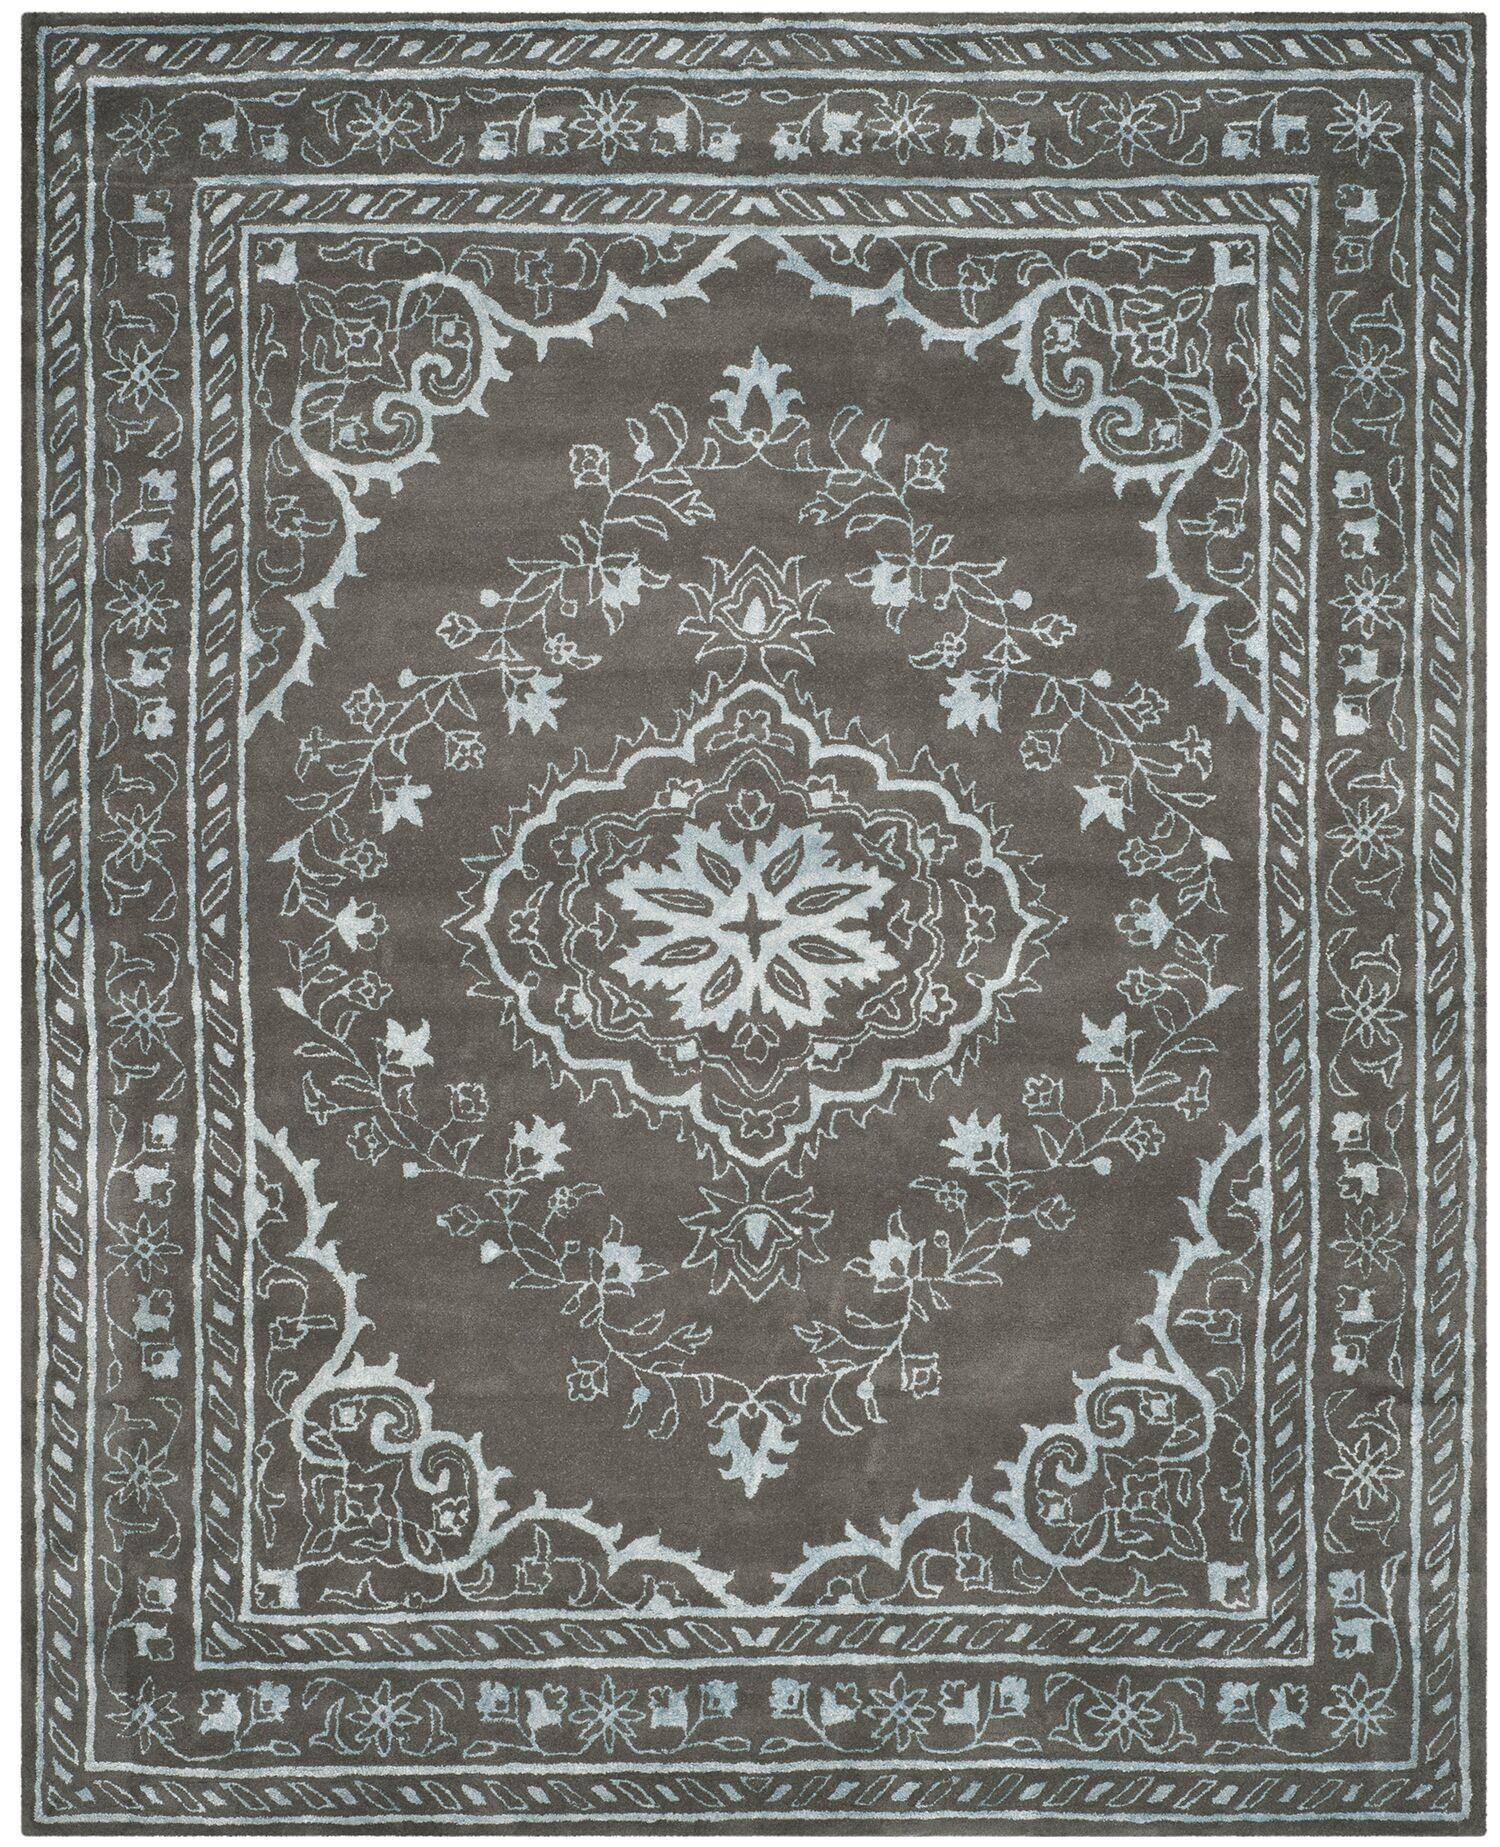 Samaniego Hand-Tufted Dark Gray Area Rug Rug Size: Rectangle 8' x 10'